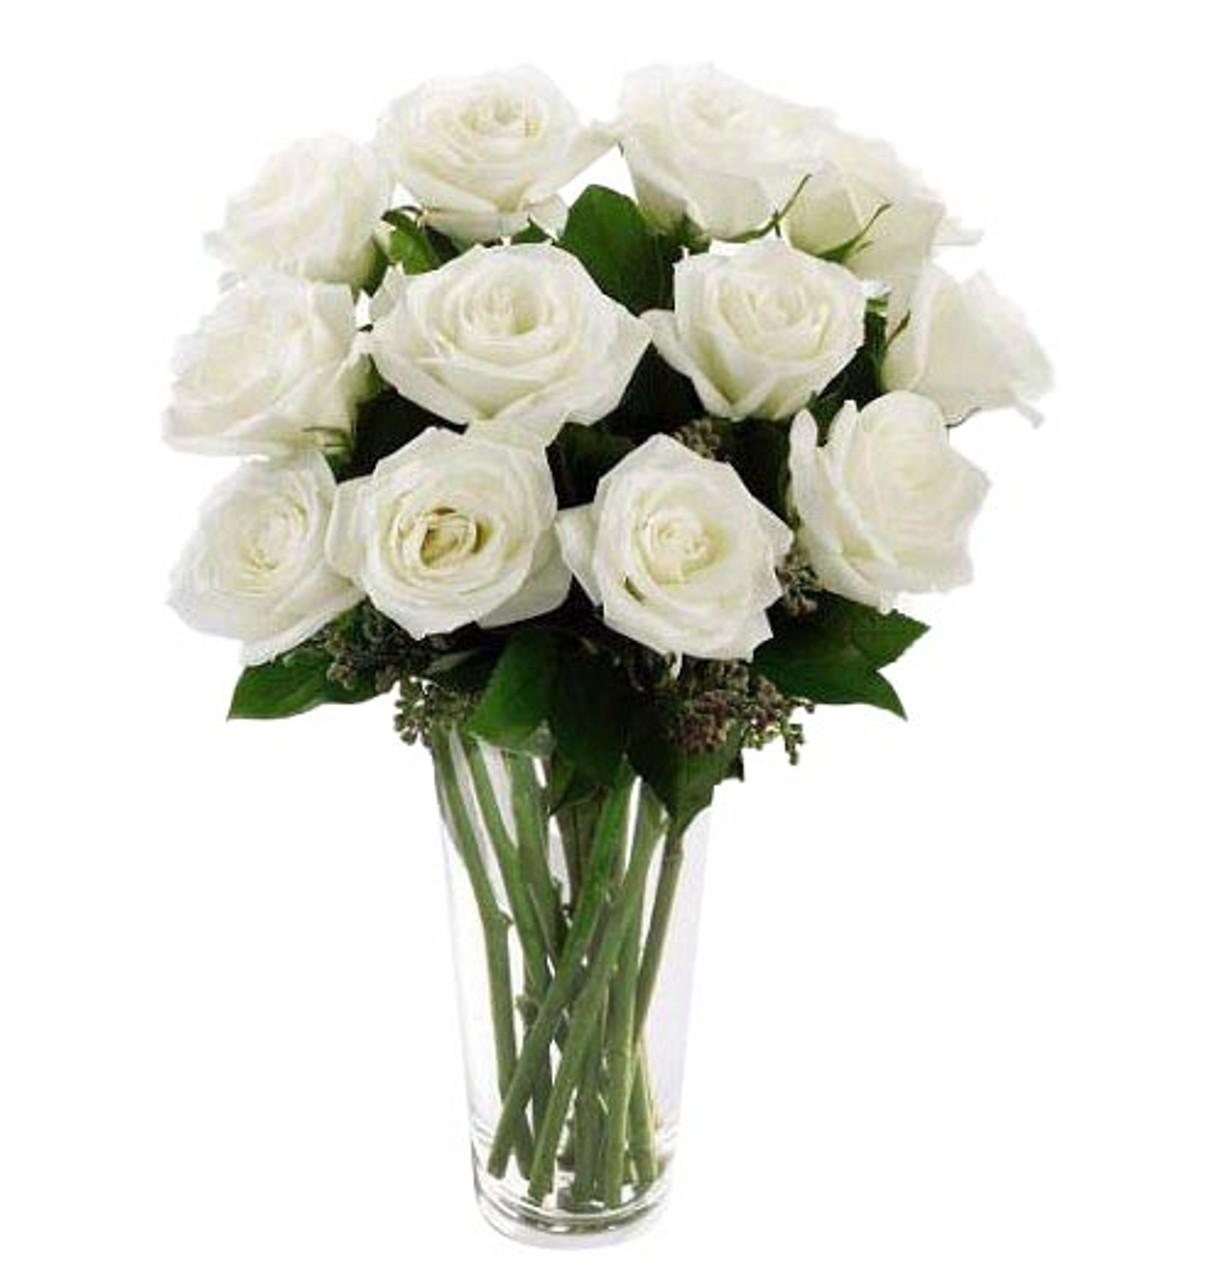 12 White Ecuadorian Roses